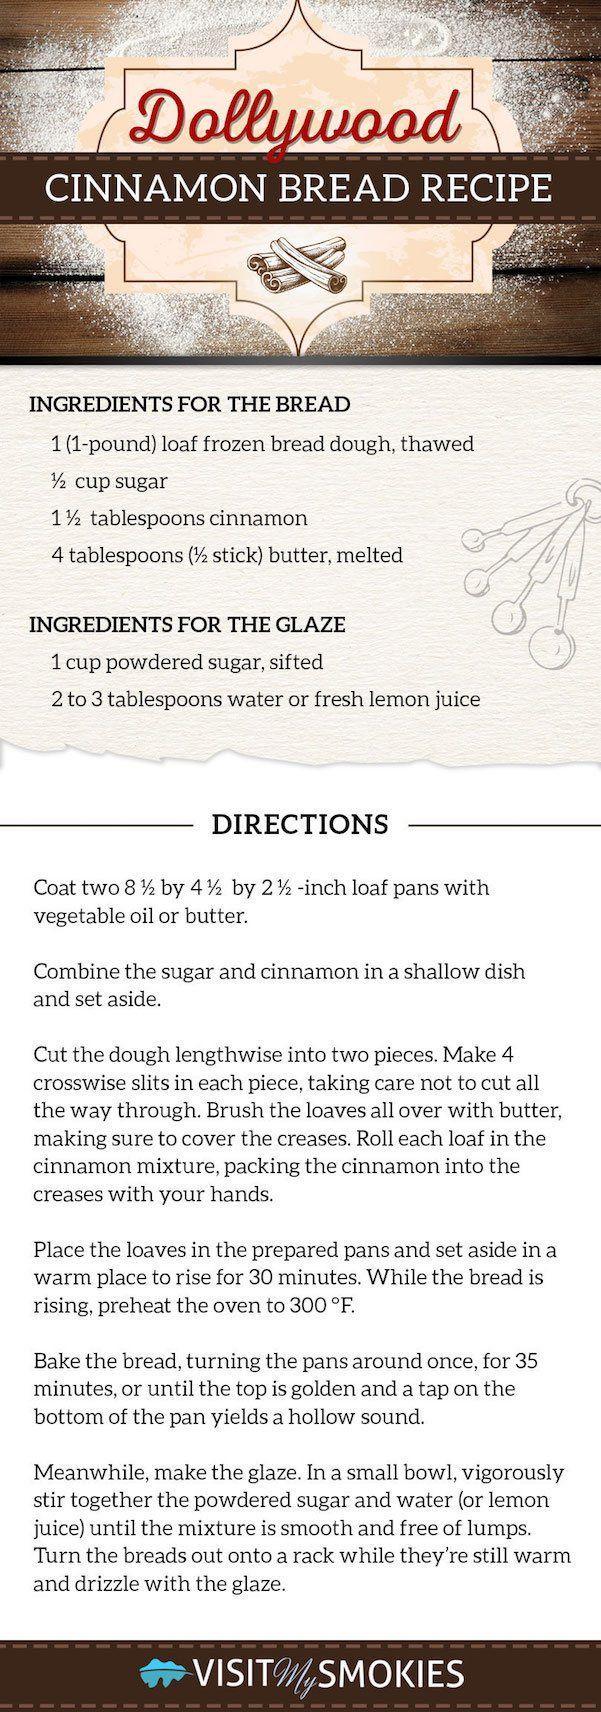 Dollywood Cinnamon Bread Recipe.